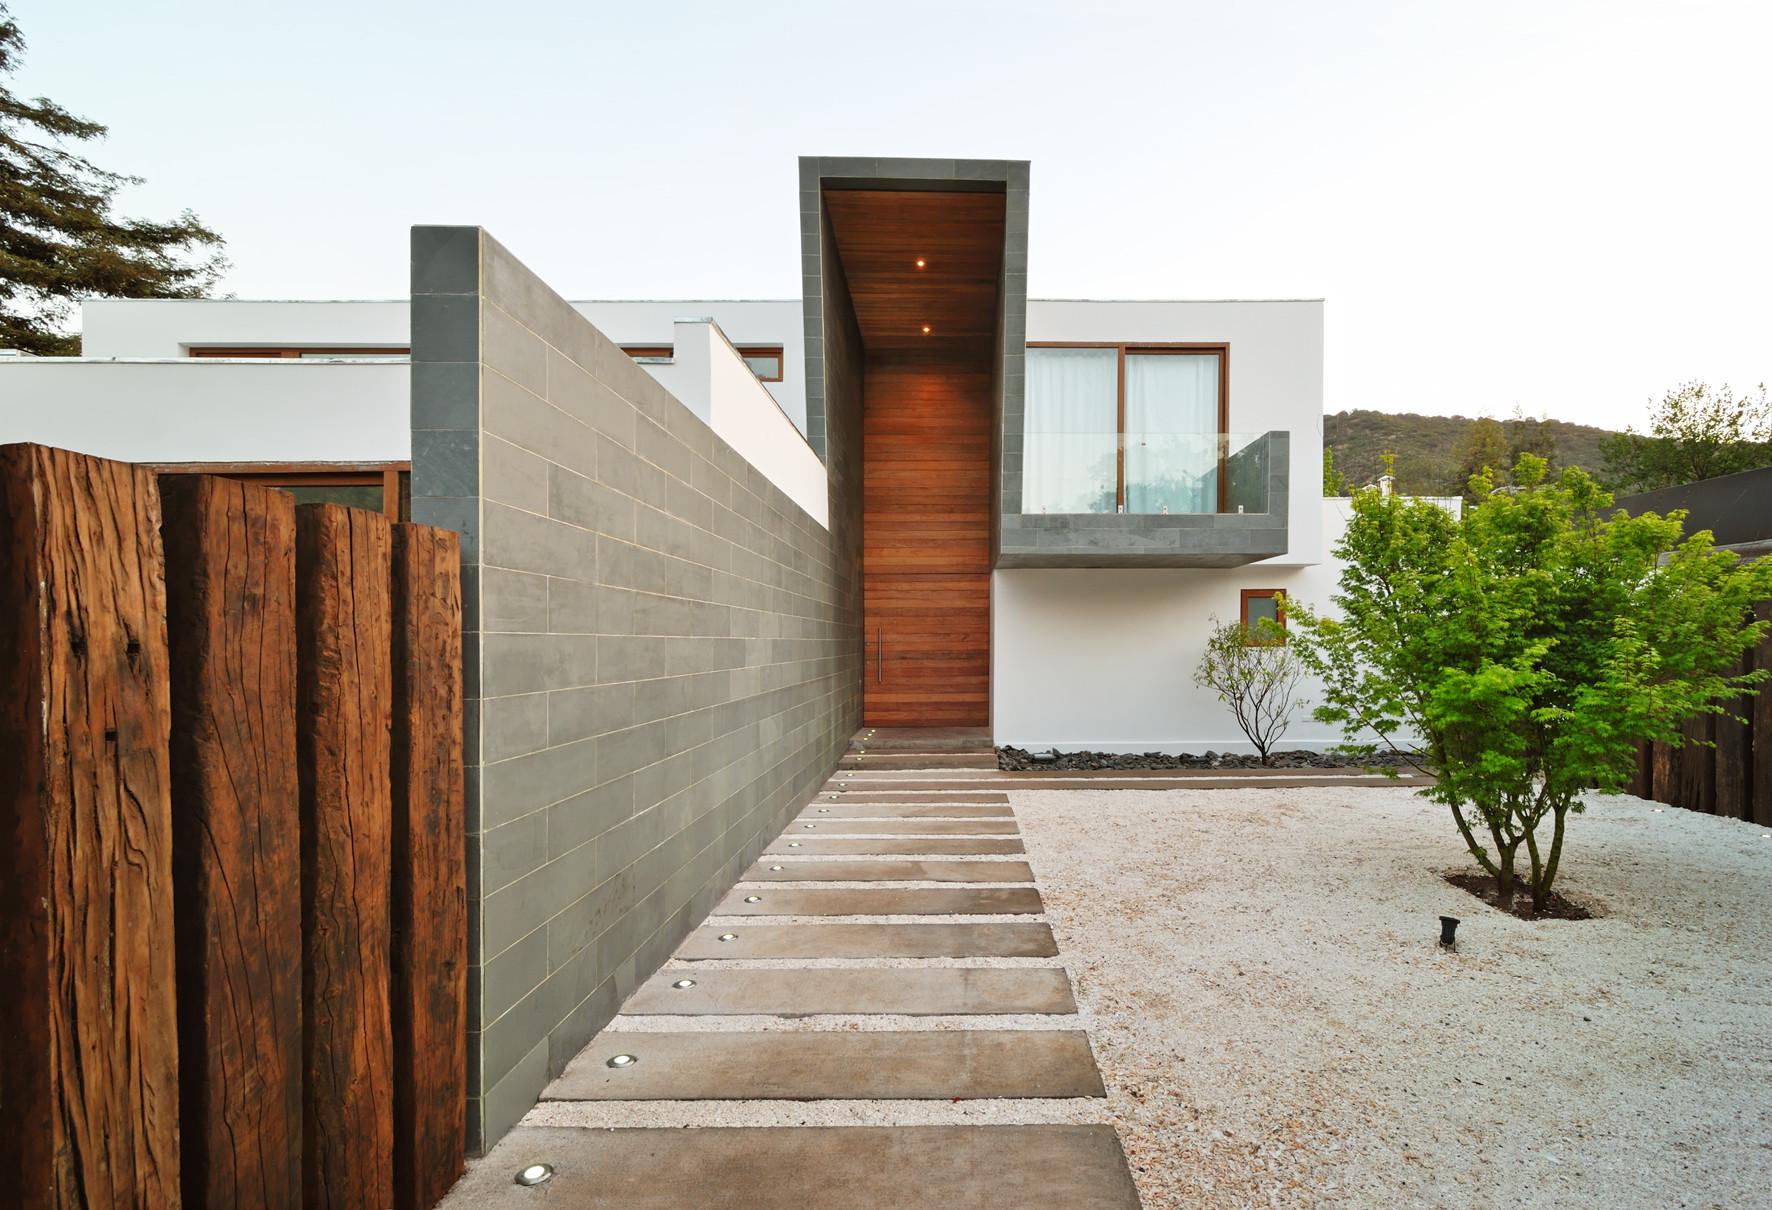 Casa 3 Elementos / Tomás Swett, © Felipe Fontecilla